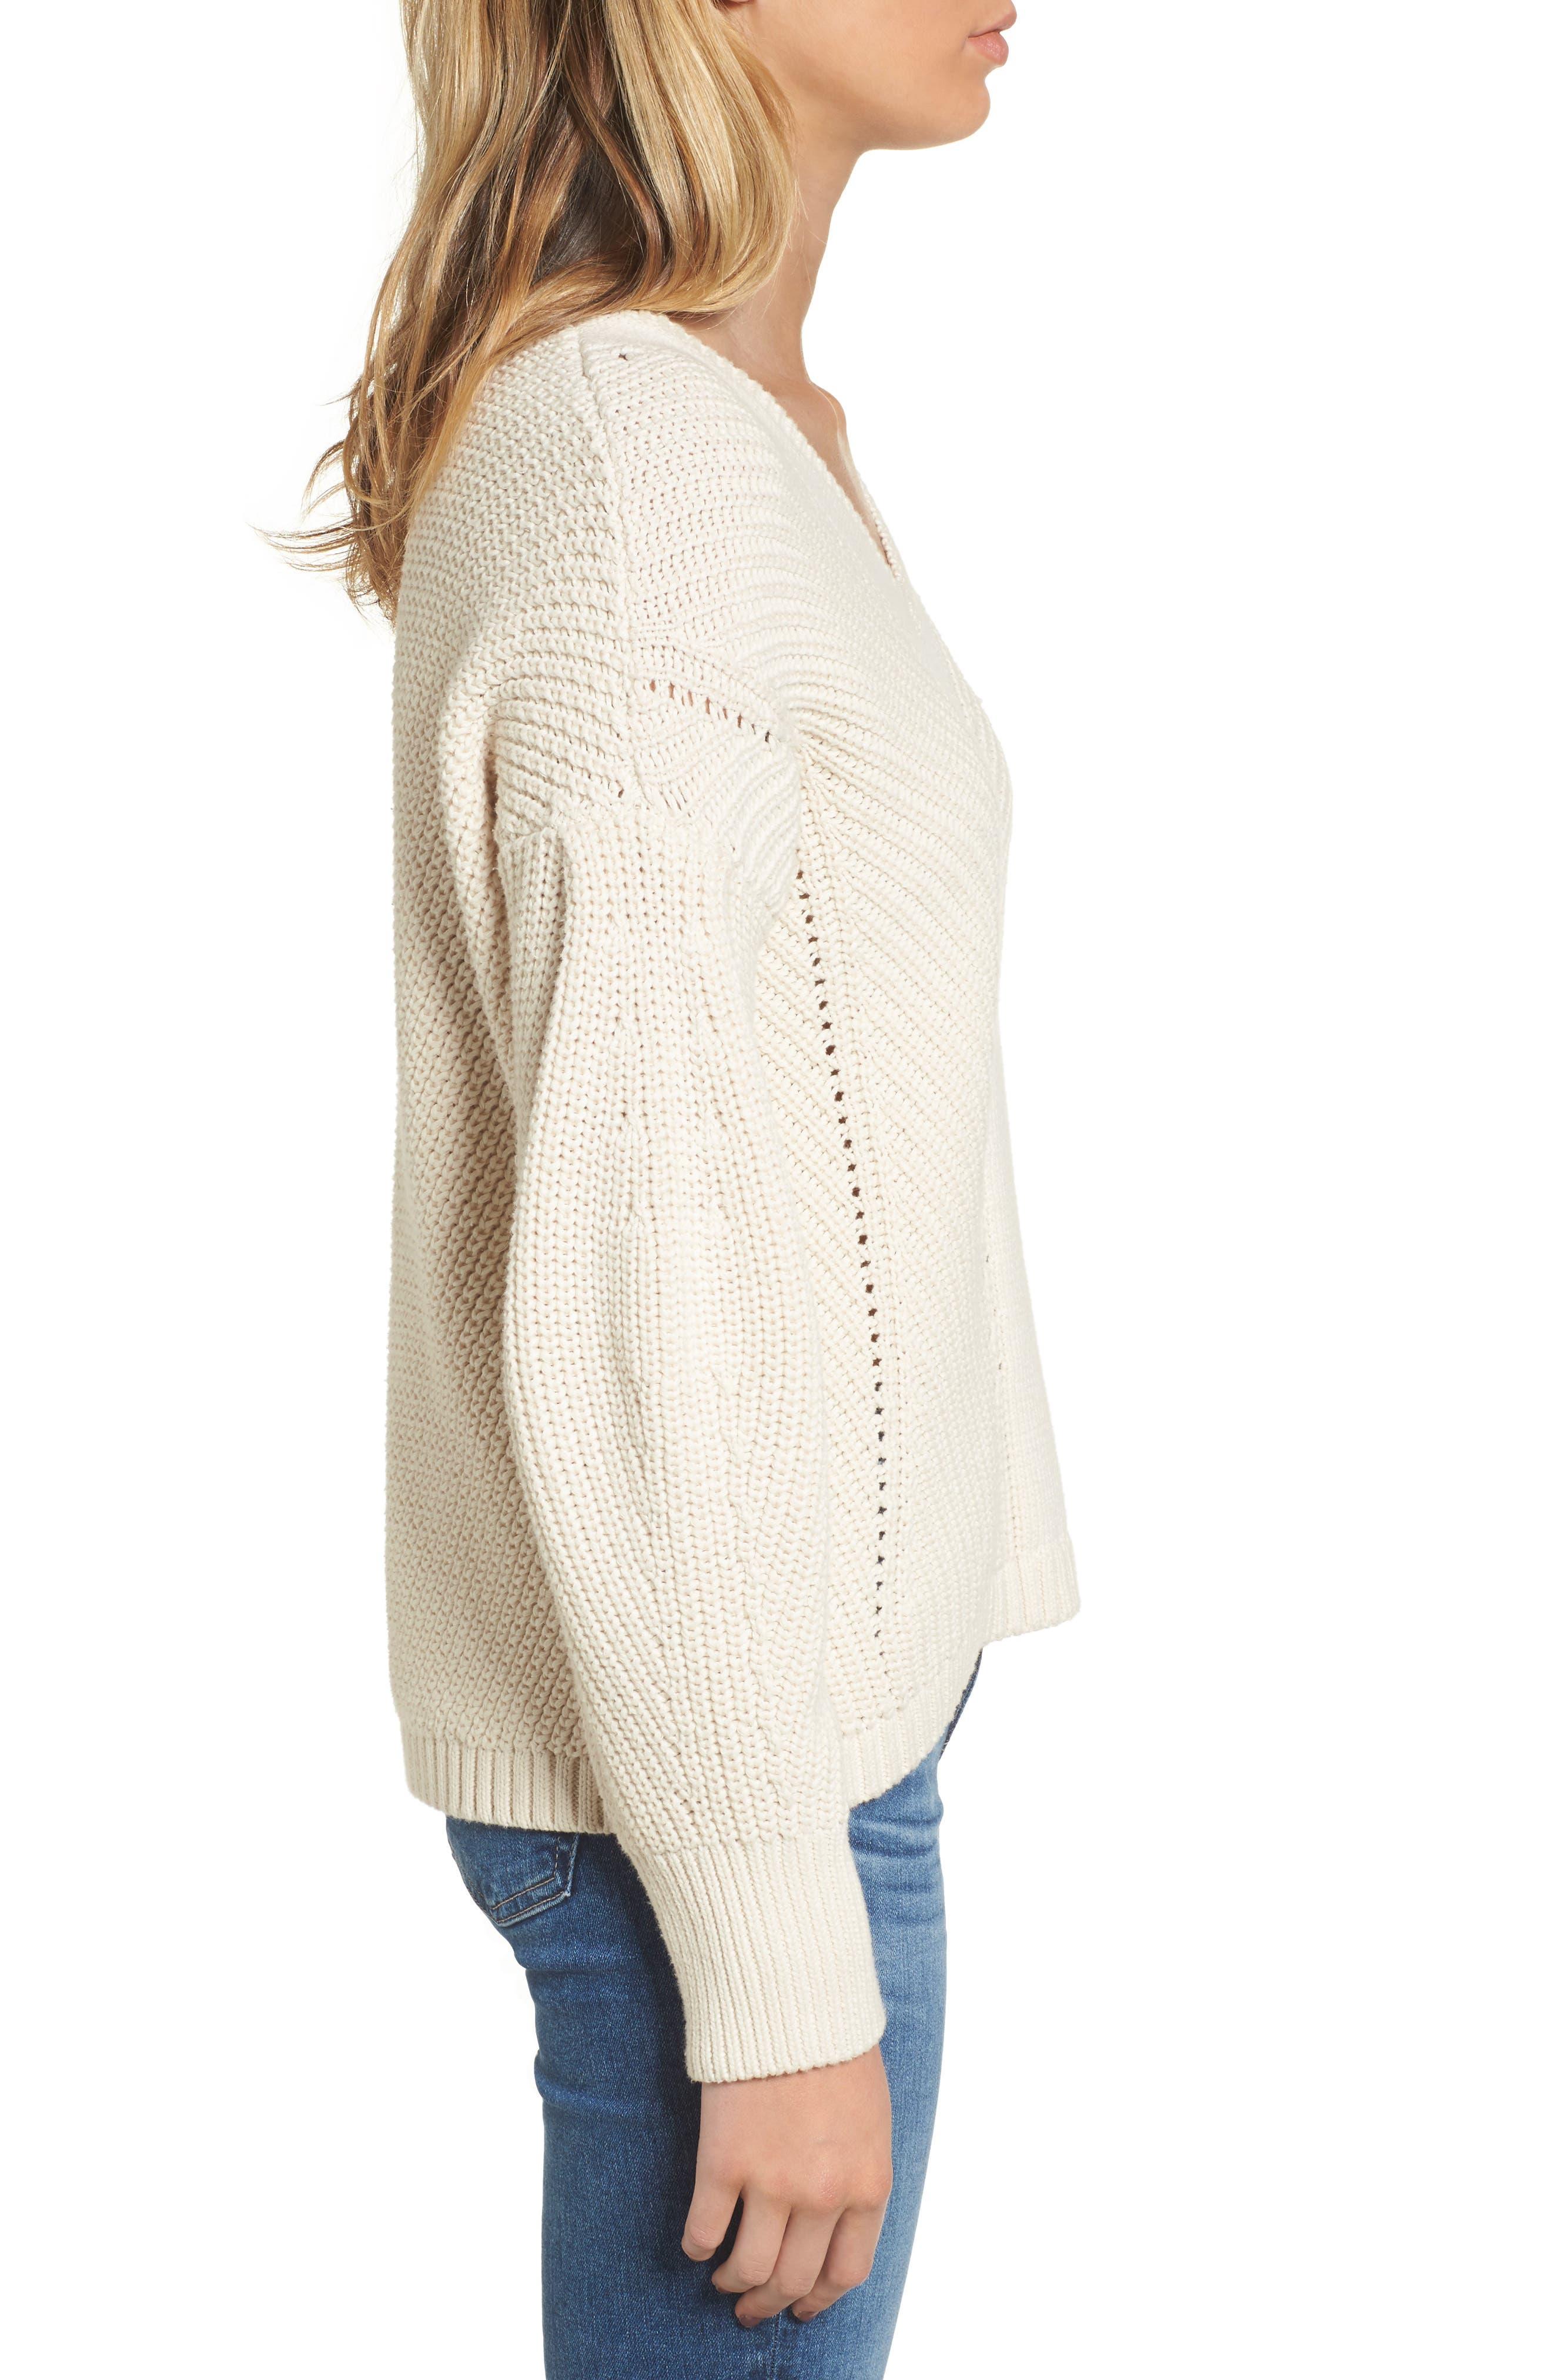 Millie Mozart Sweater,                             Alternate thumbnail 3, color,                             Classic Cream